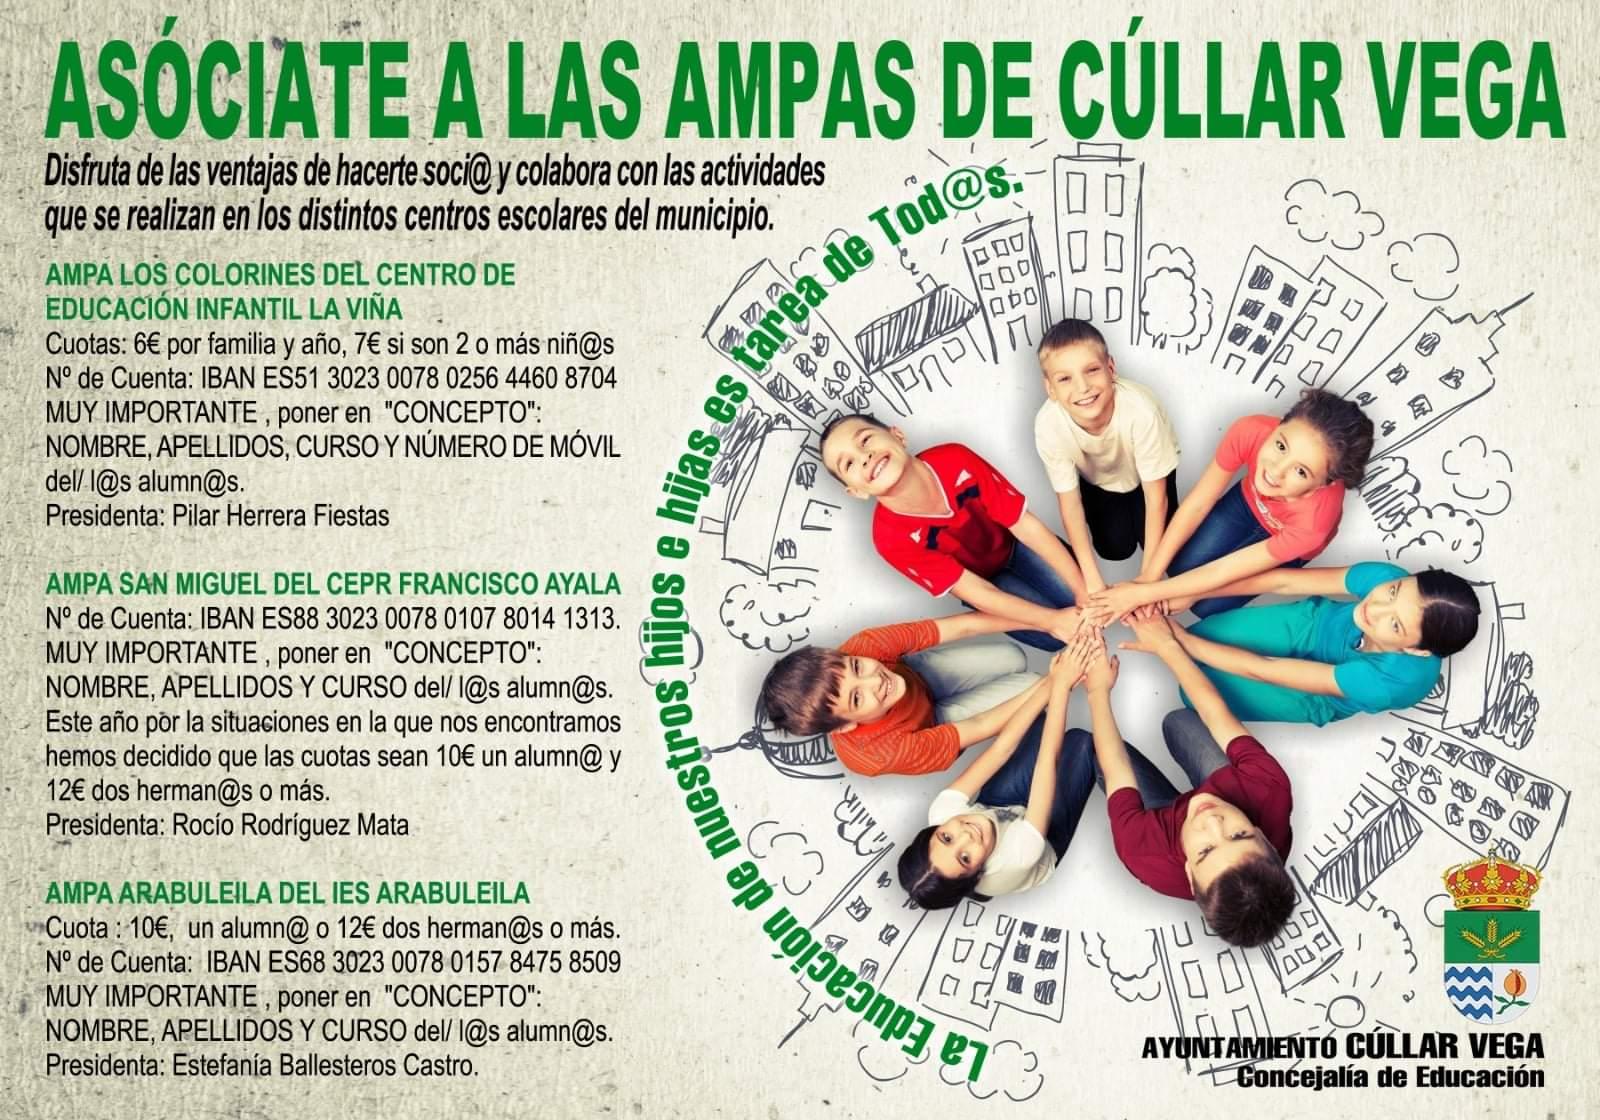 Asóciate a las AMPAS de Cúllar Vega